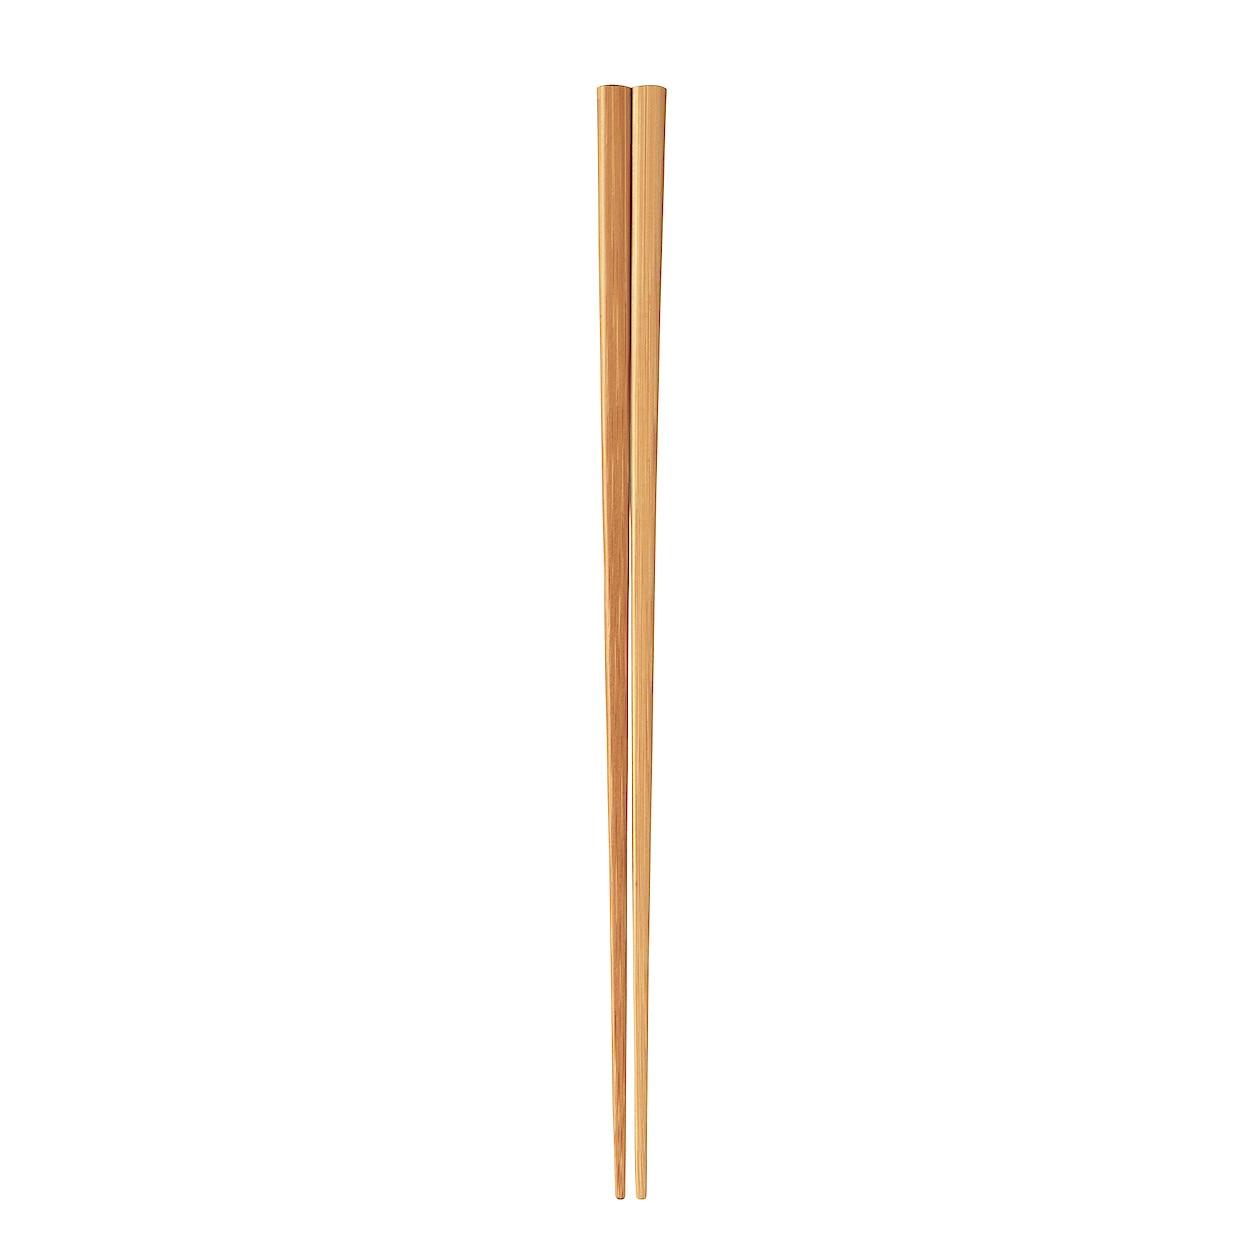 RoomClip商品情報 - 竹箸